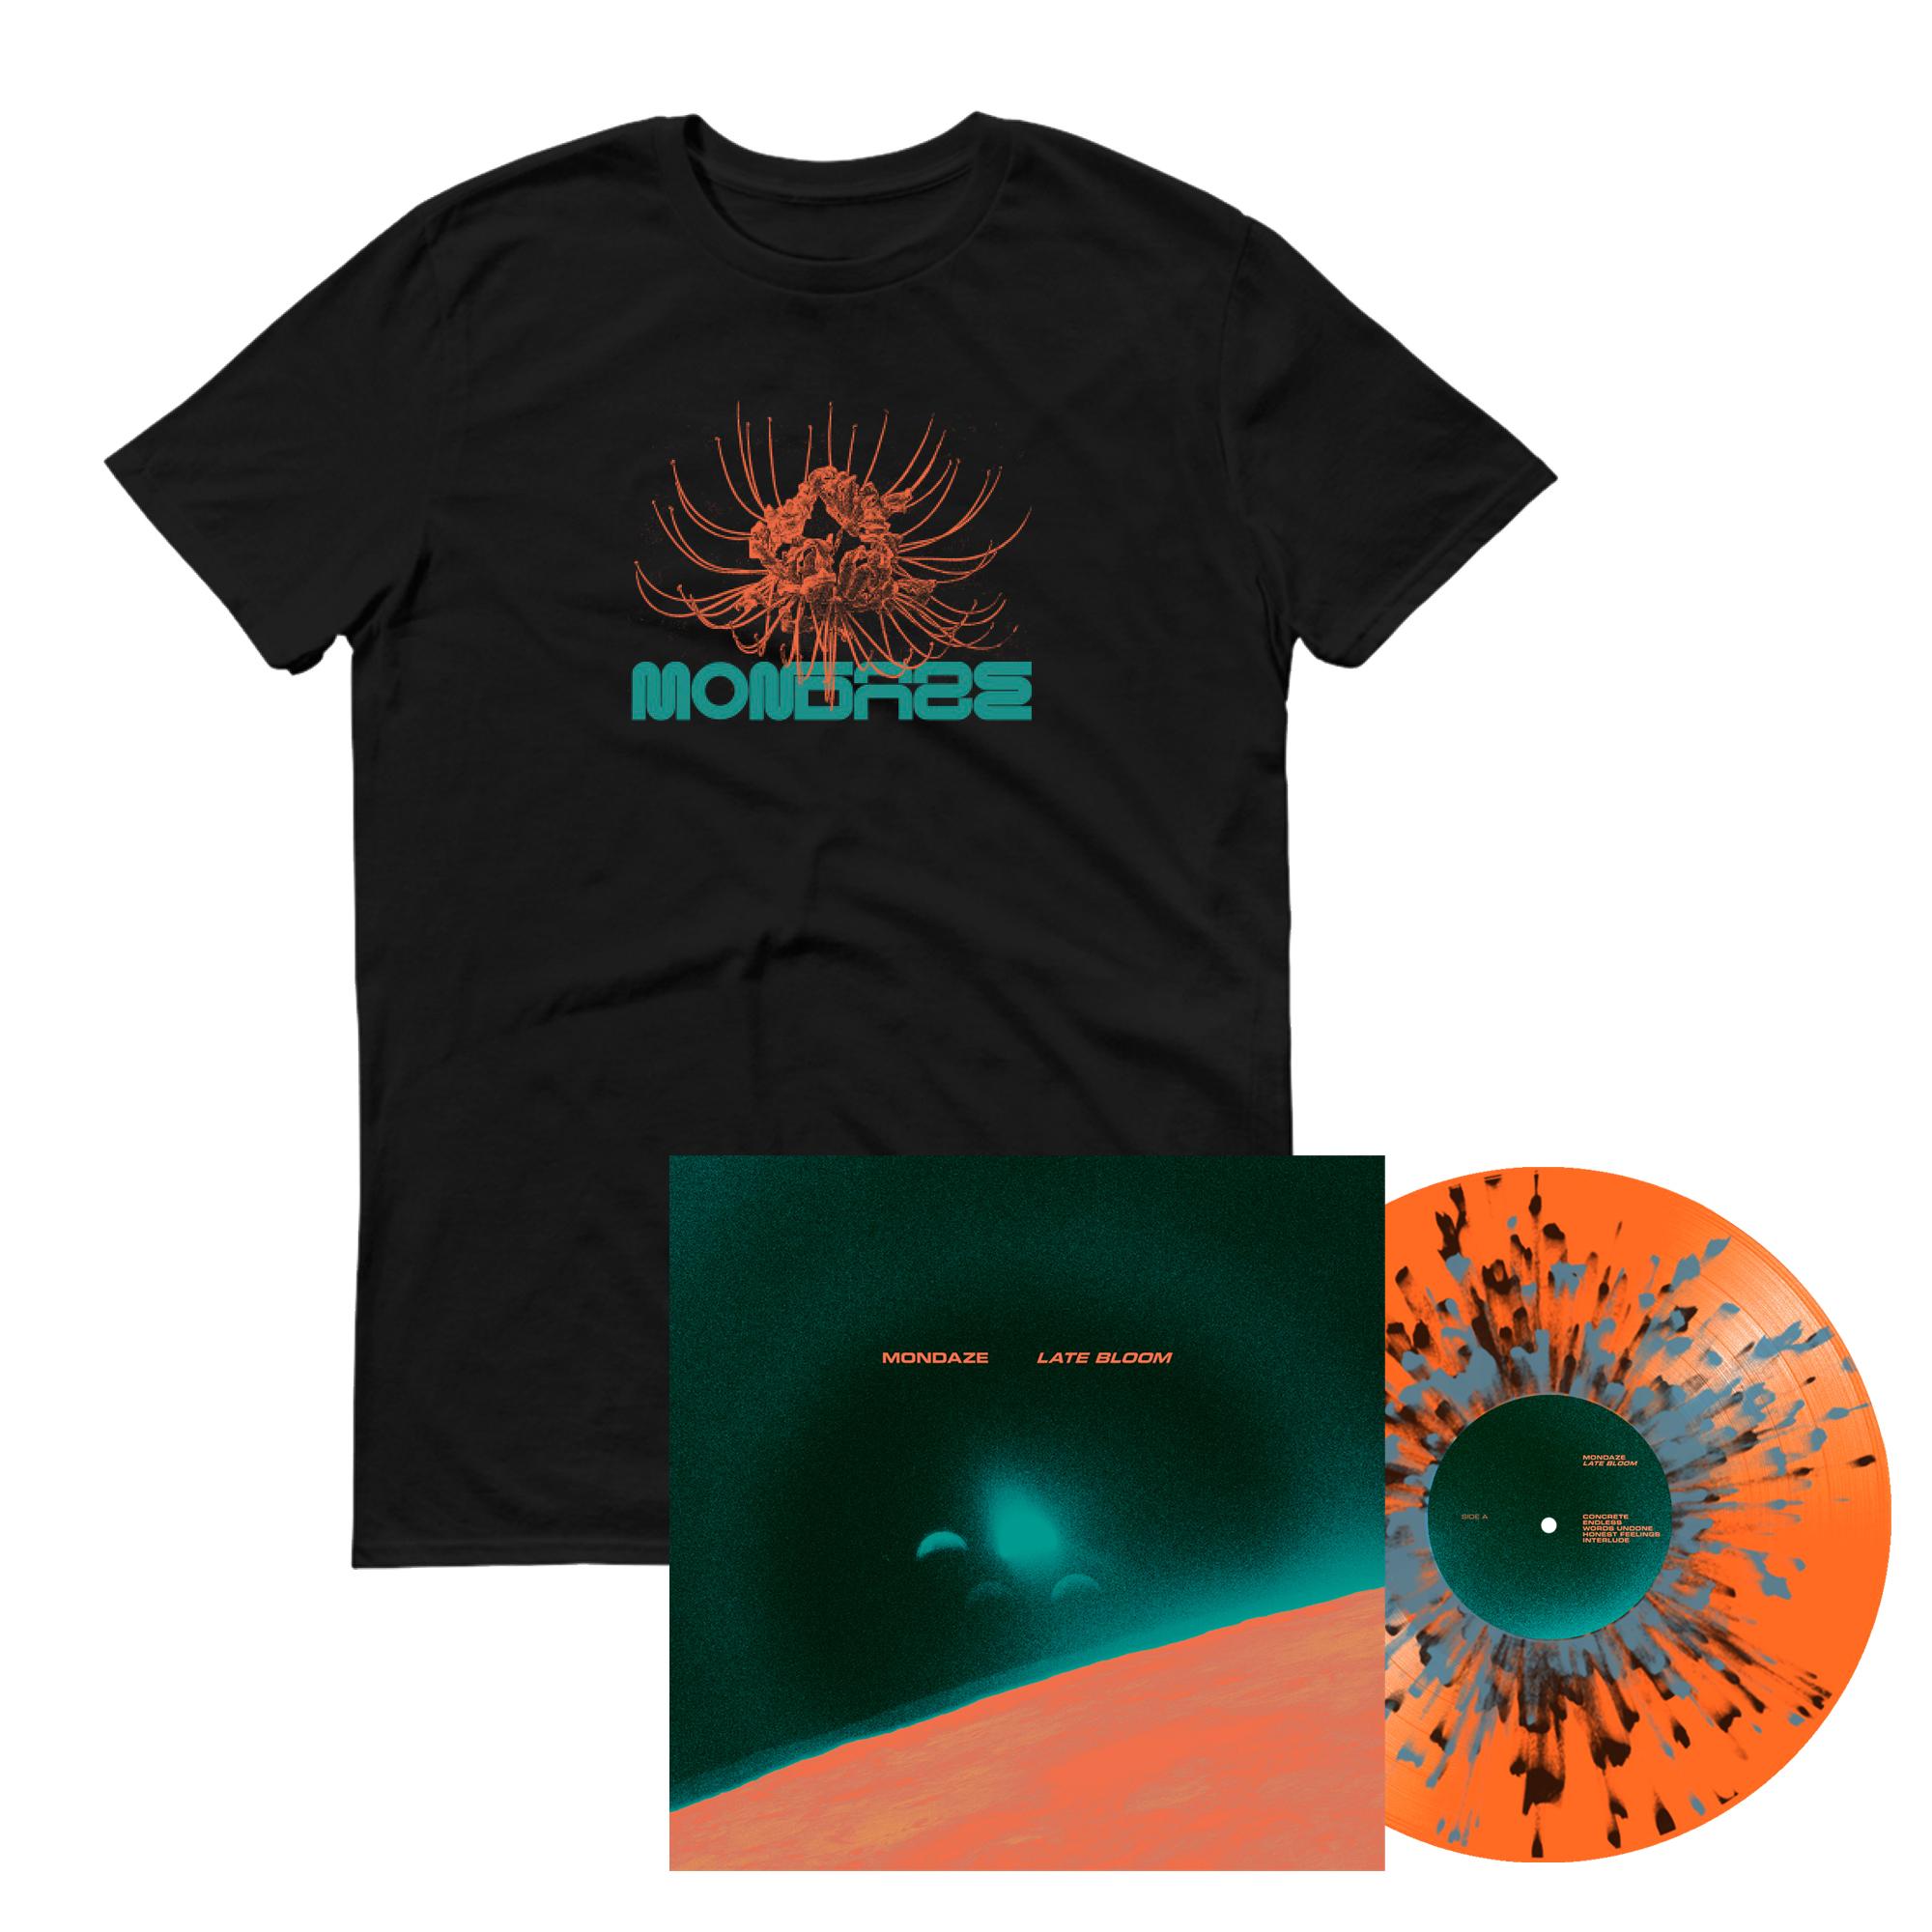 Mondaze - Late Bloom LP + shirt PRE-ORDER